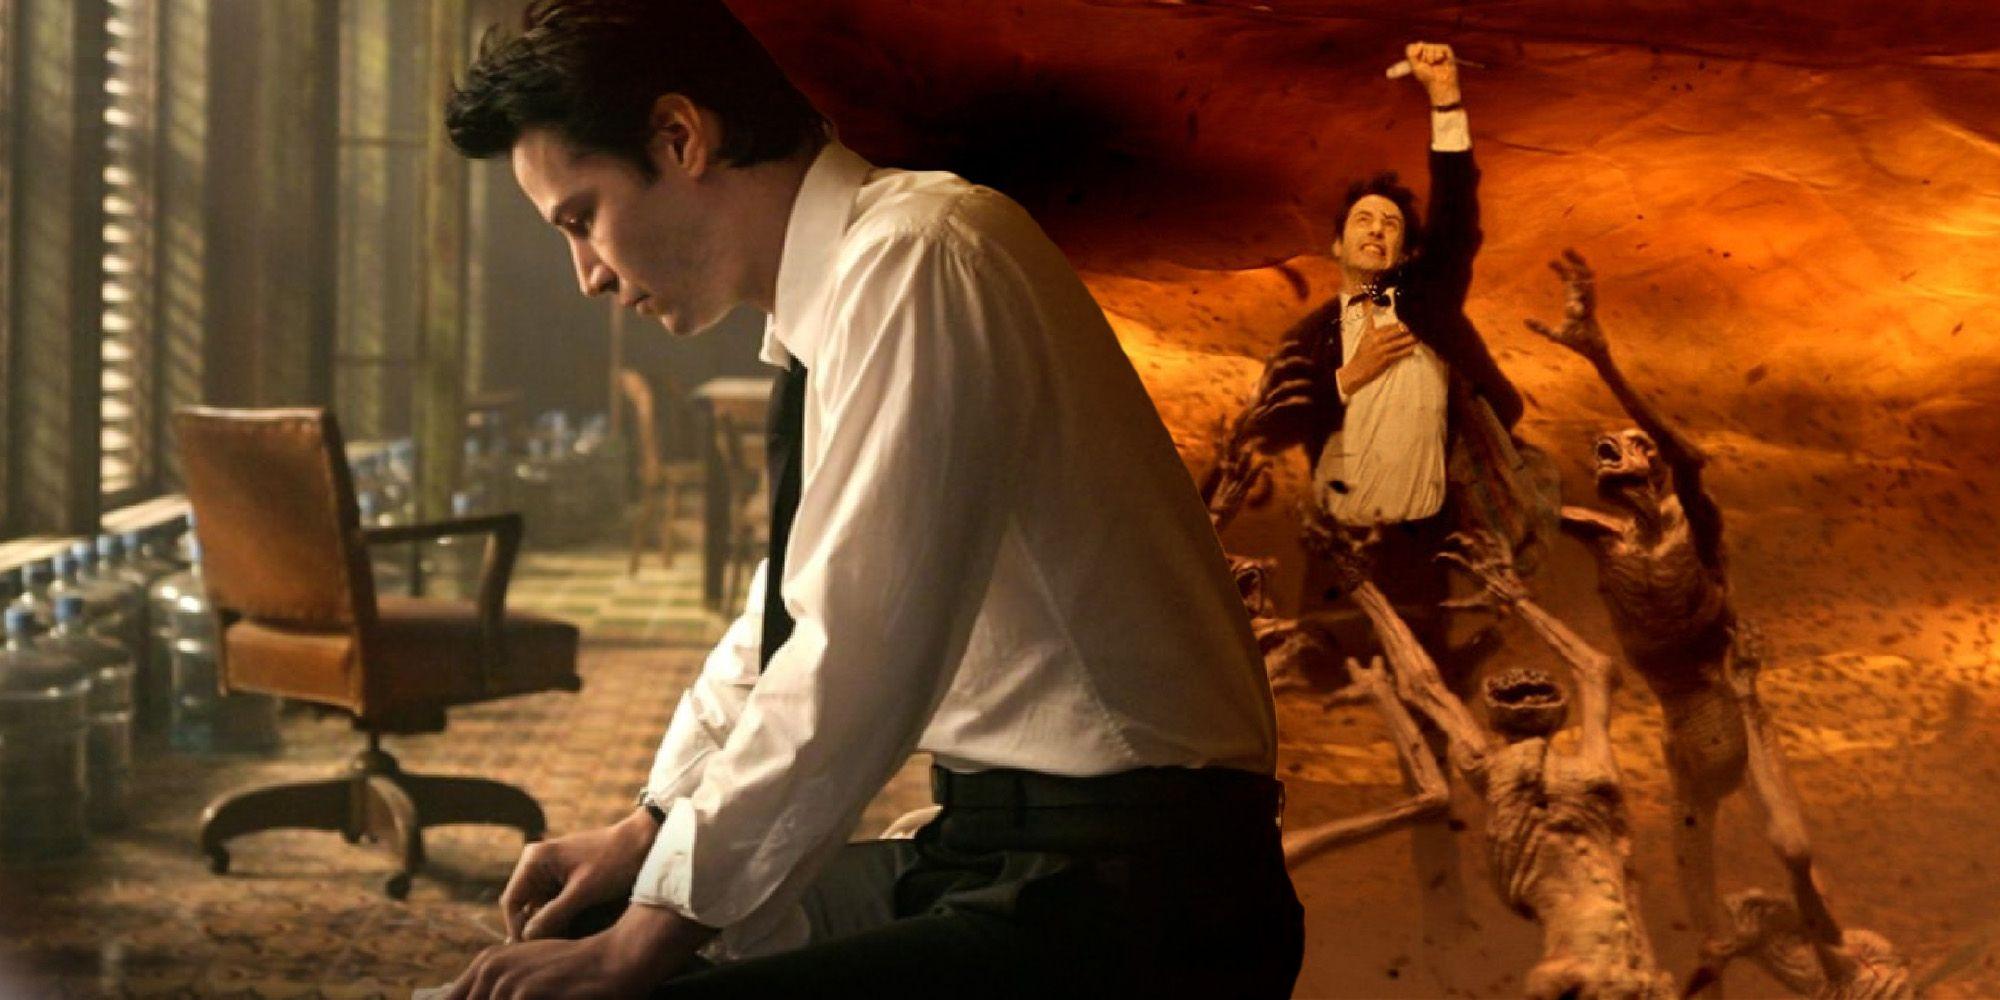 Constantine 20 Release Date Updates, Cast & Story Details